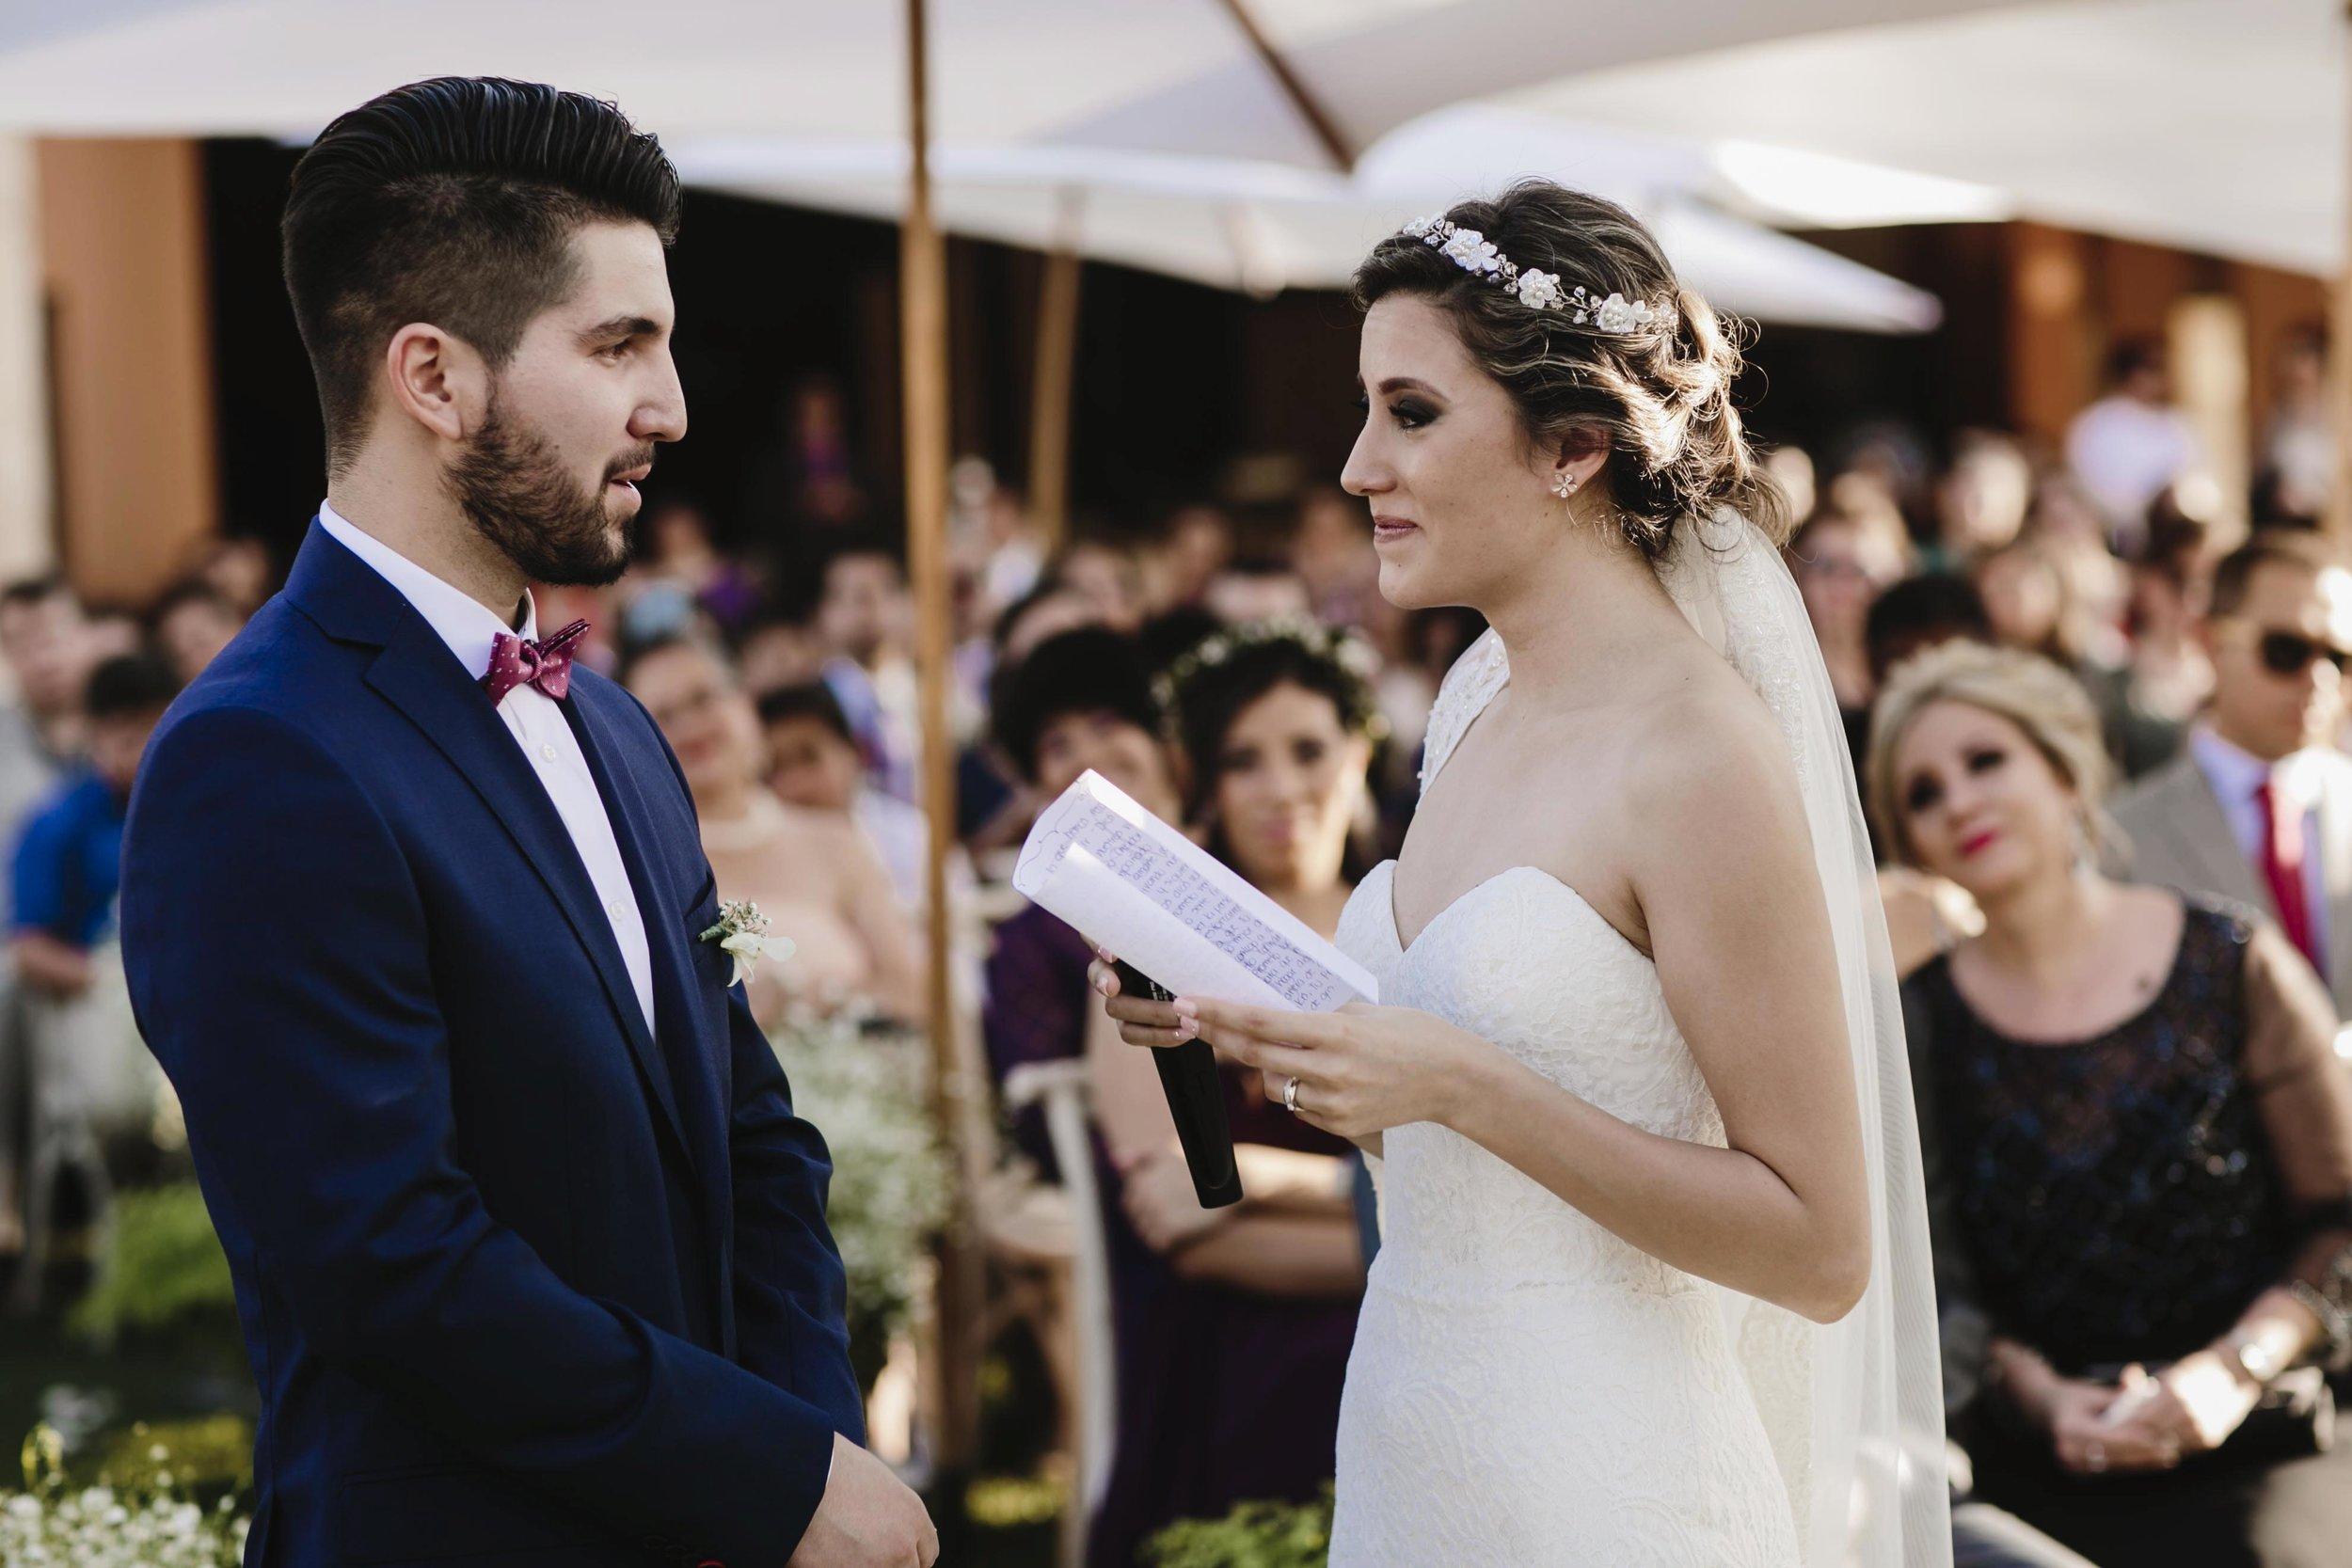 alfonso_flores_destination_wedding_photography_jardin_amarello_cuernavaca95.jpg